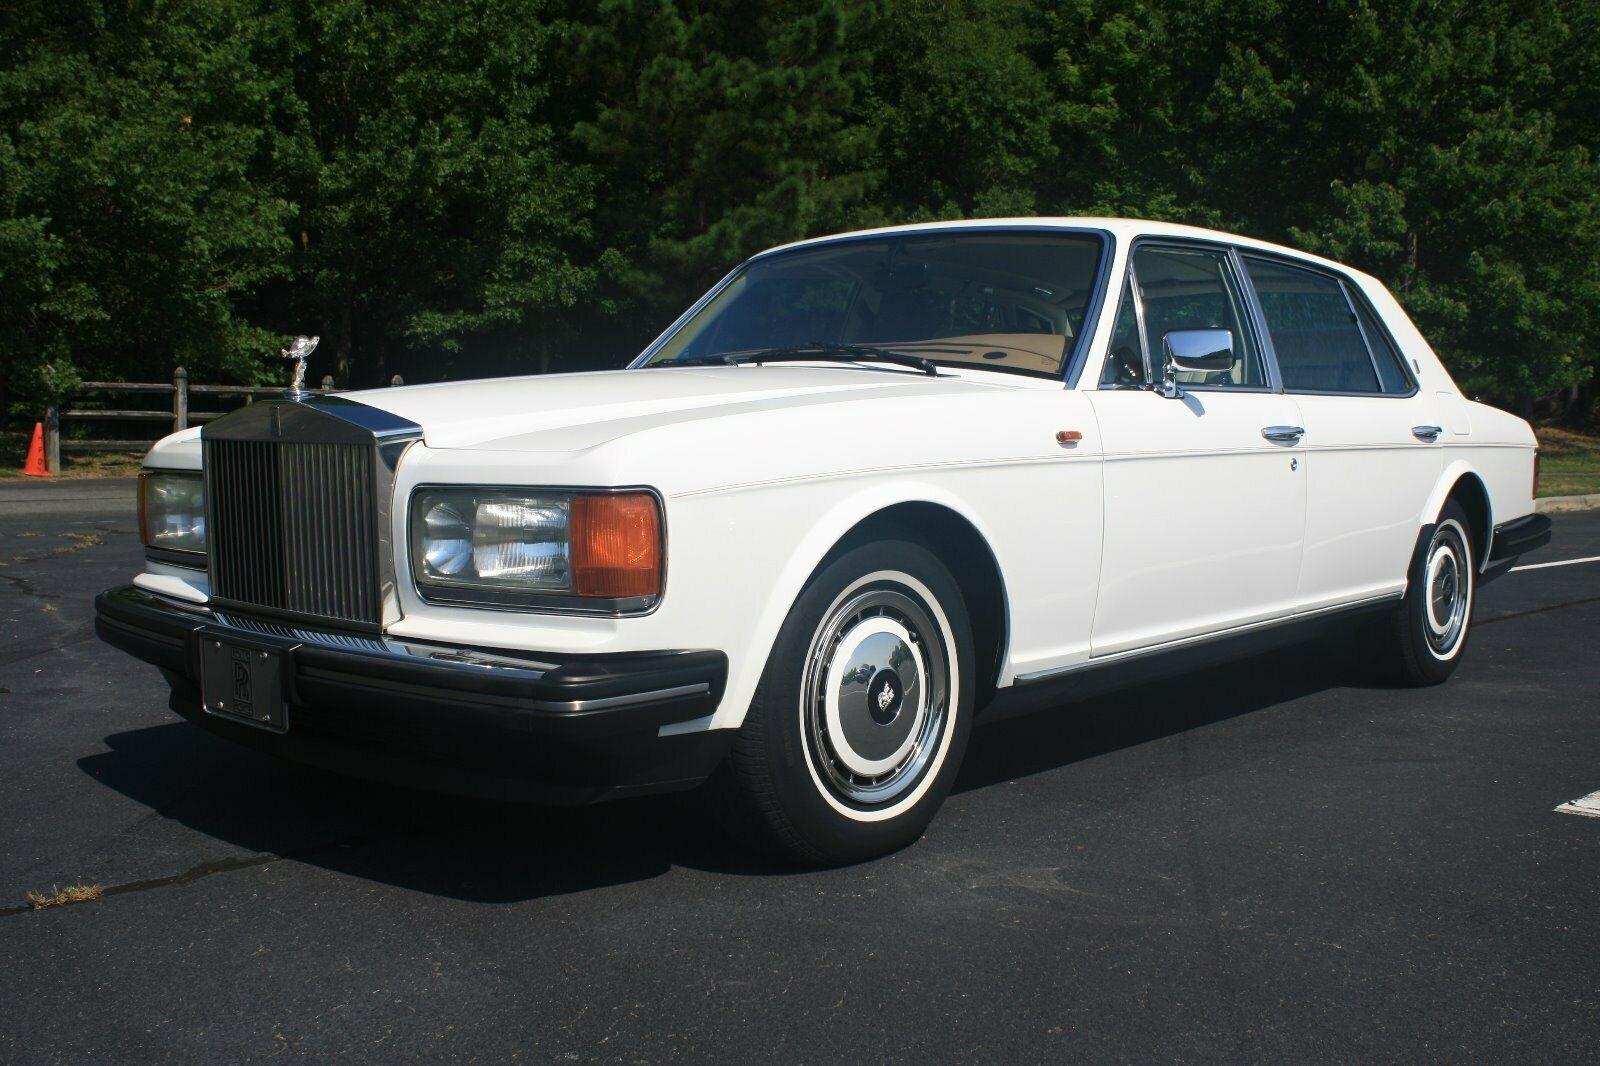 Used 1994 Rolls Royce Silver Spur III